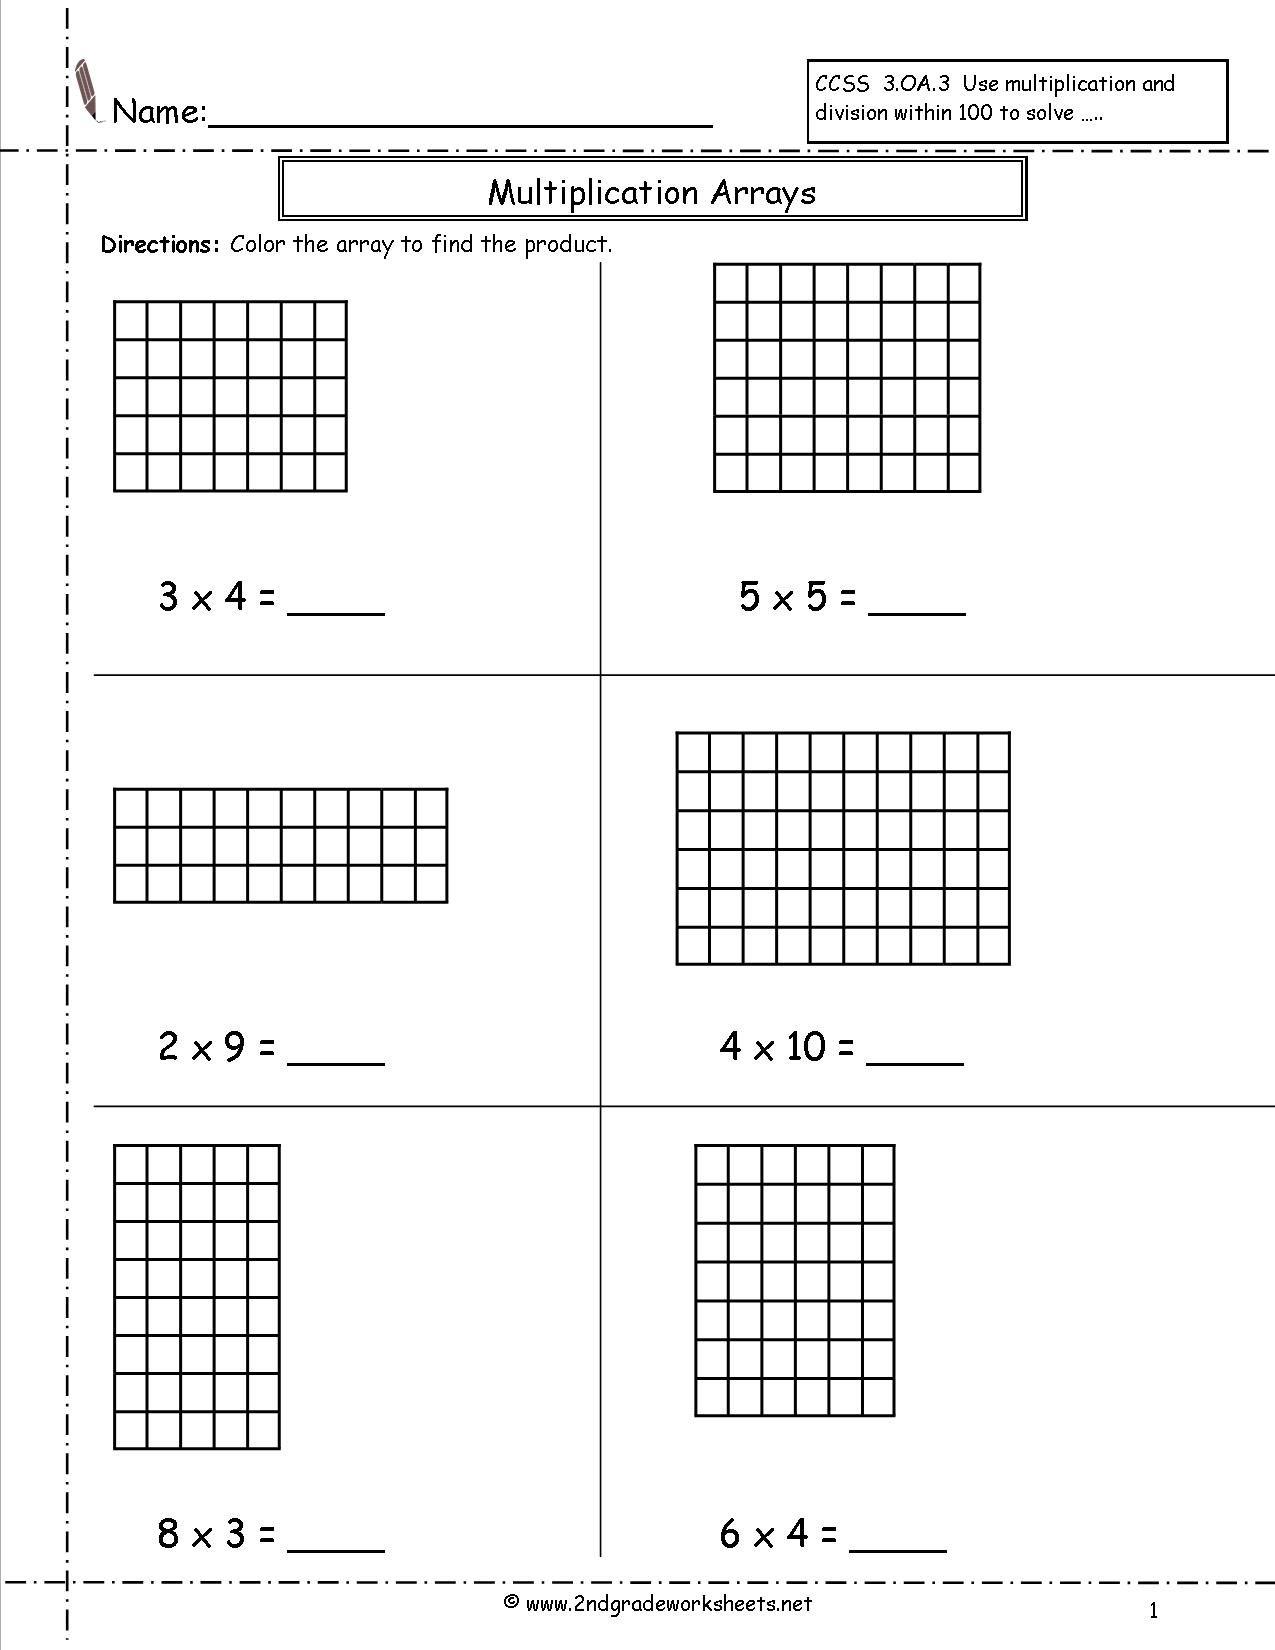 Arrays Worksheets | Multiplication Arrays Worksheets | Array in Multiplication Worksheets Using Area Model